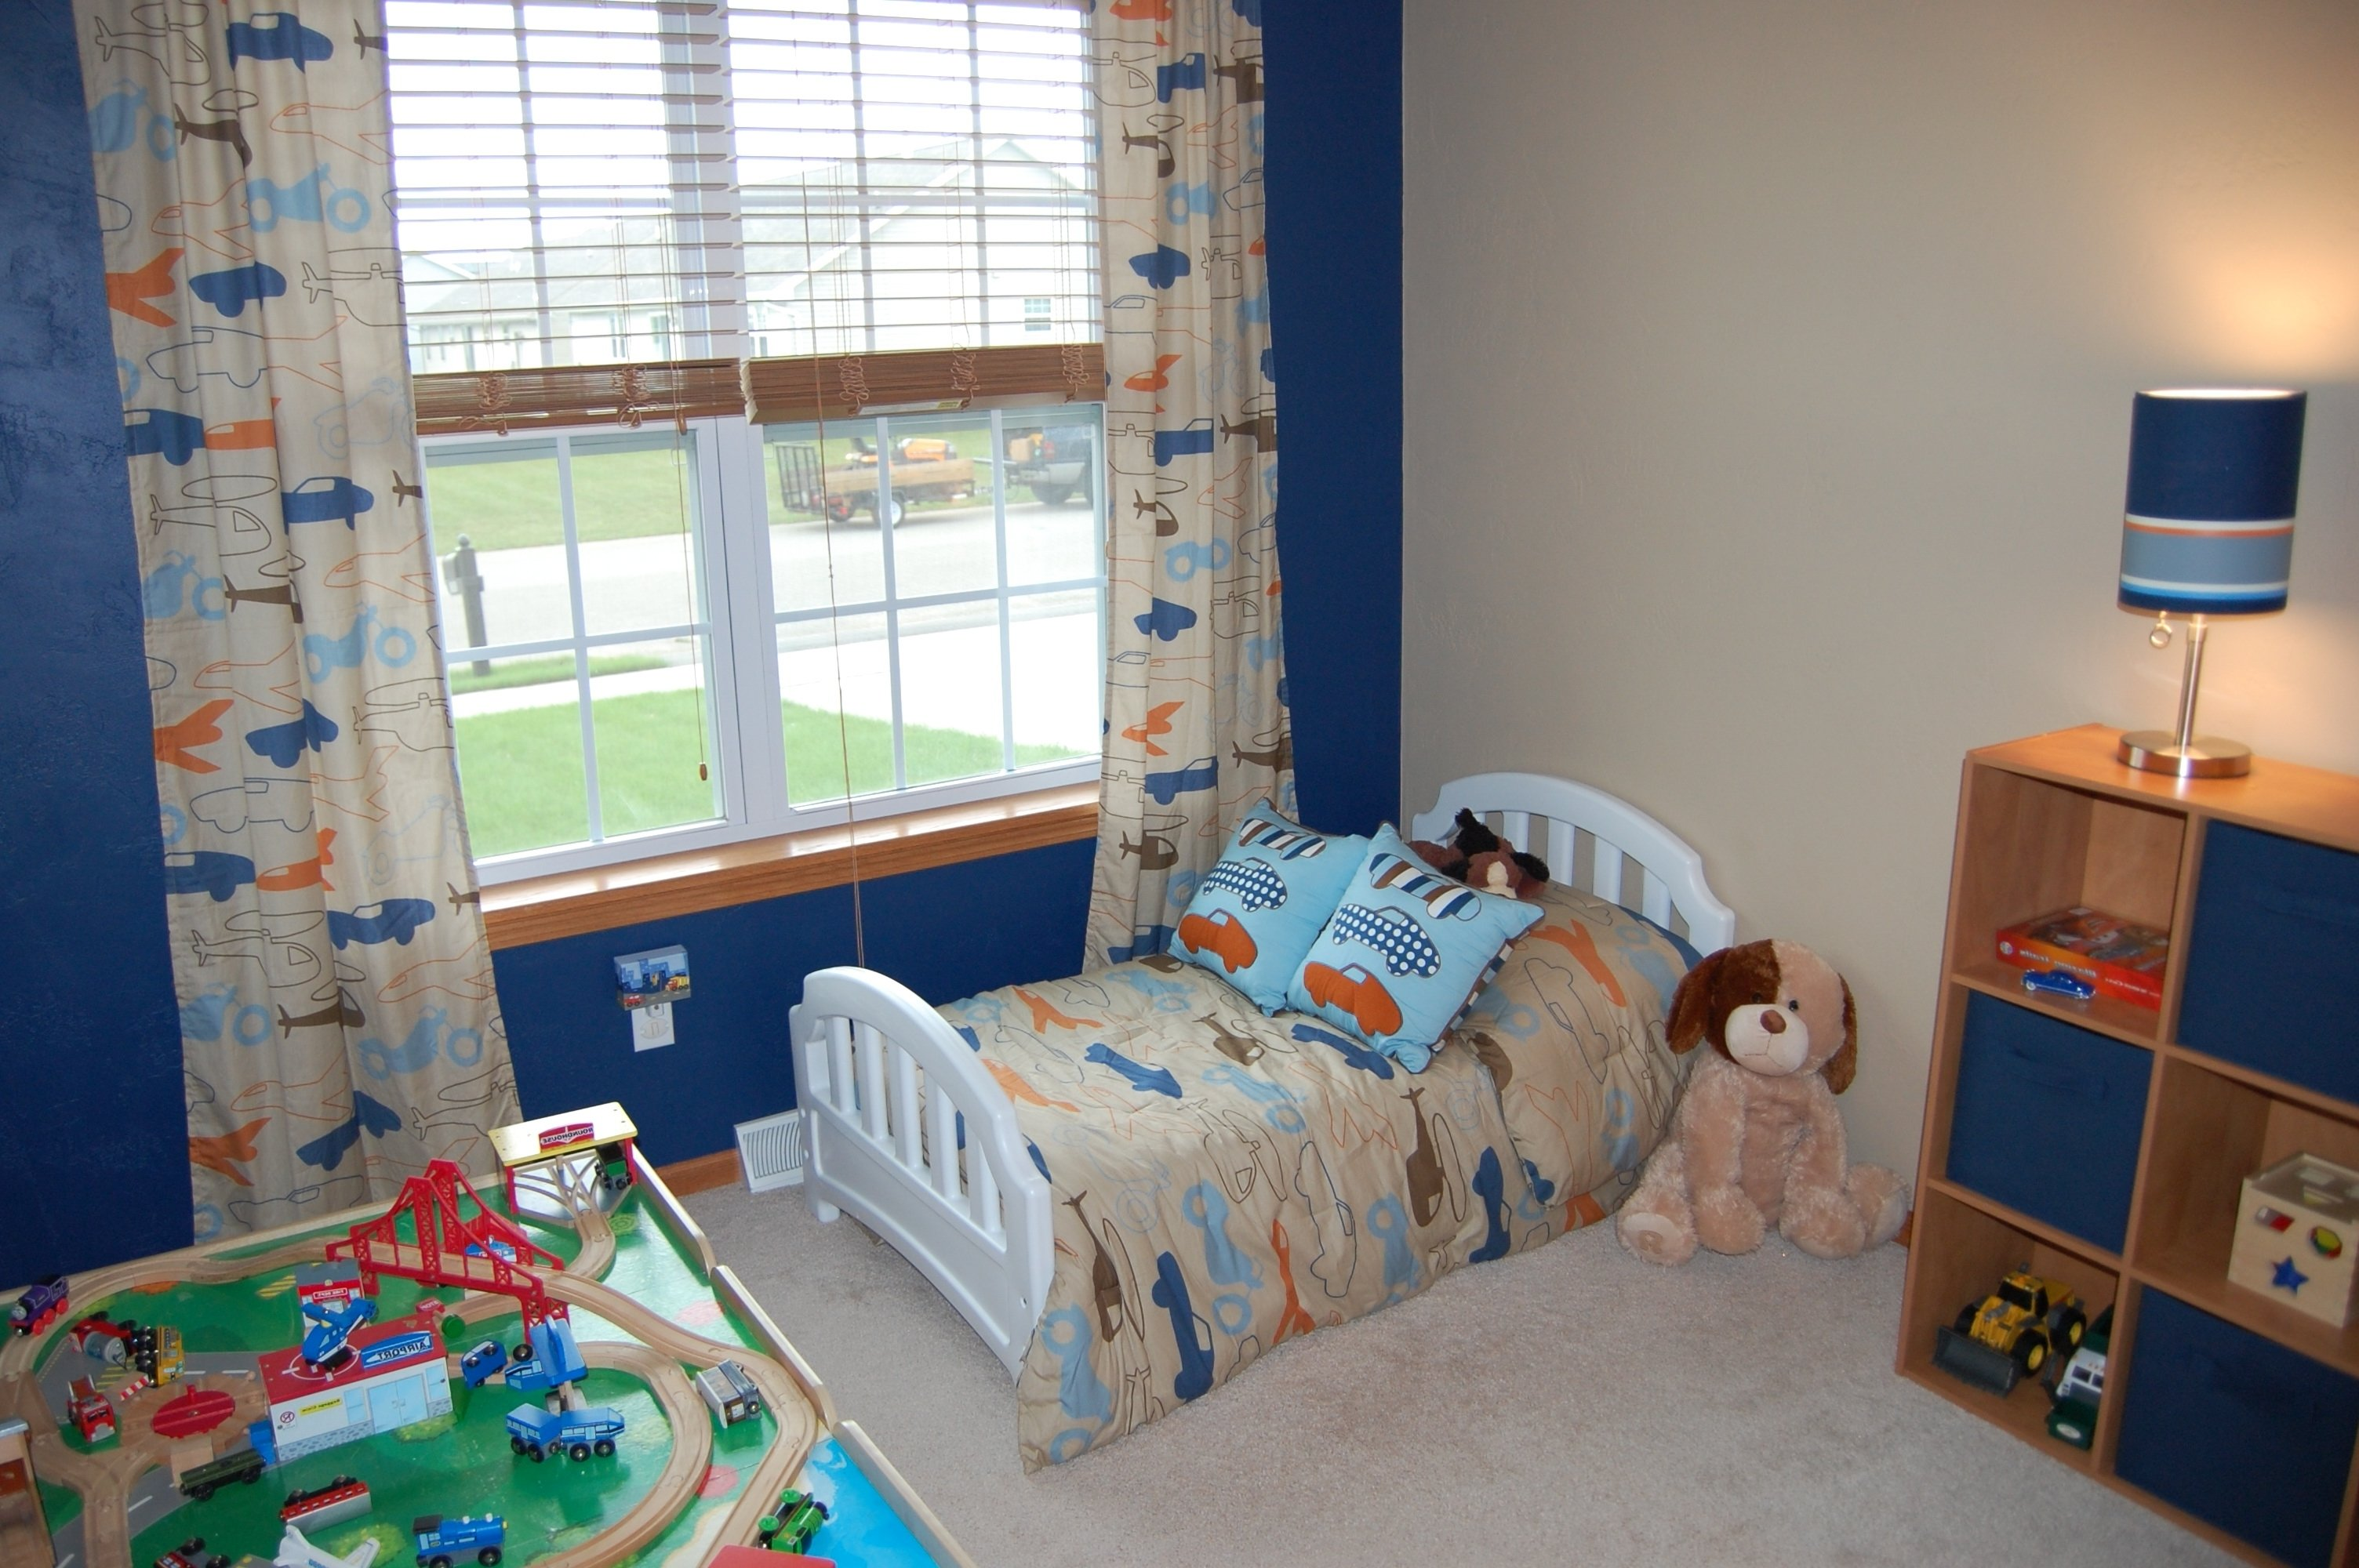 10 Fantastic Toddler Room Ideas For Boys graceful toddler boy room decor 22 bedroom ideas ideasdecor 95979